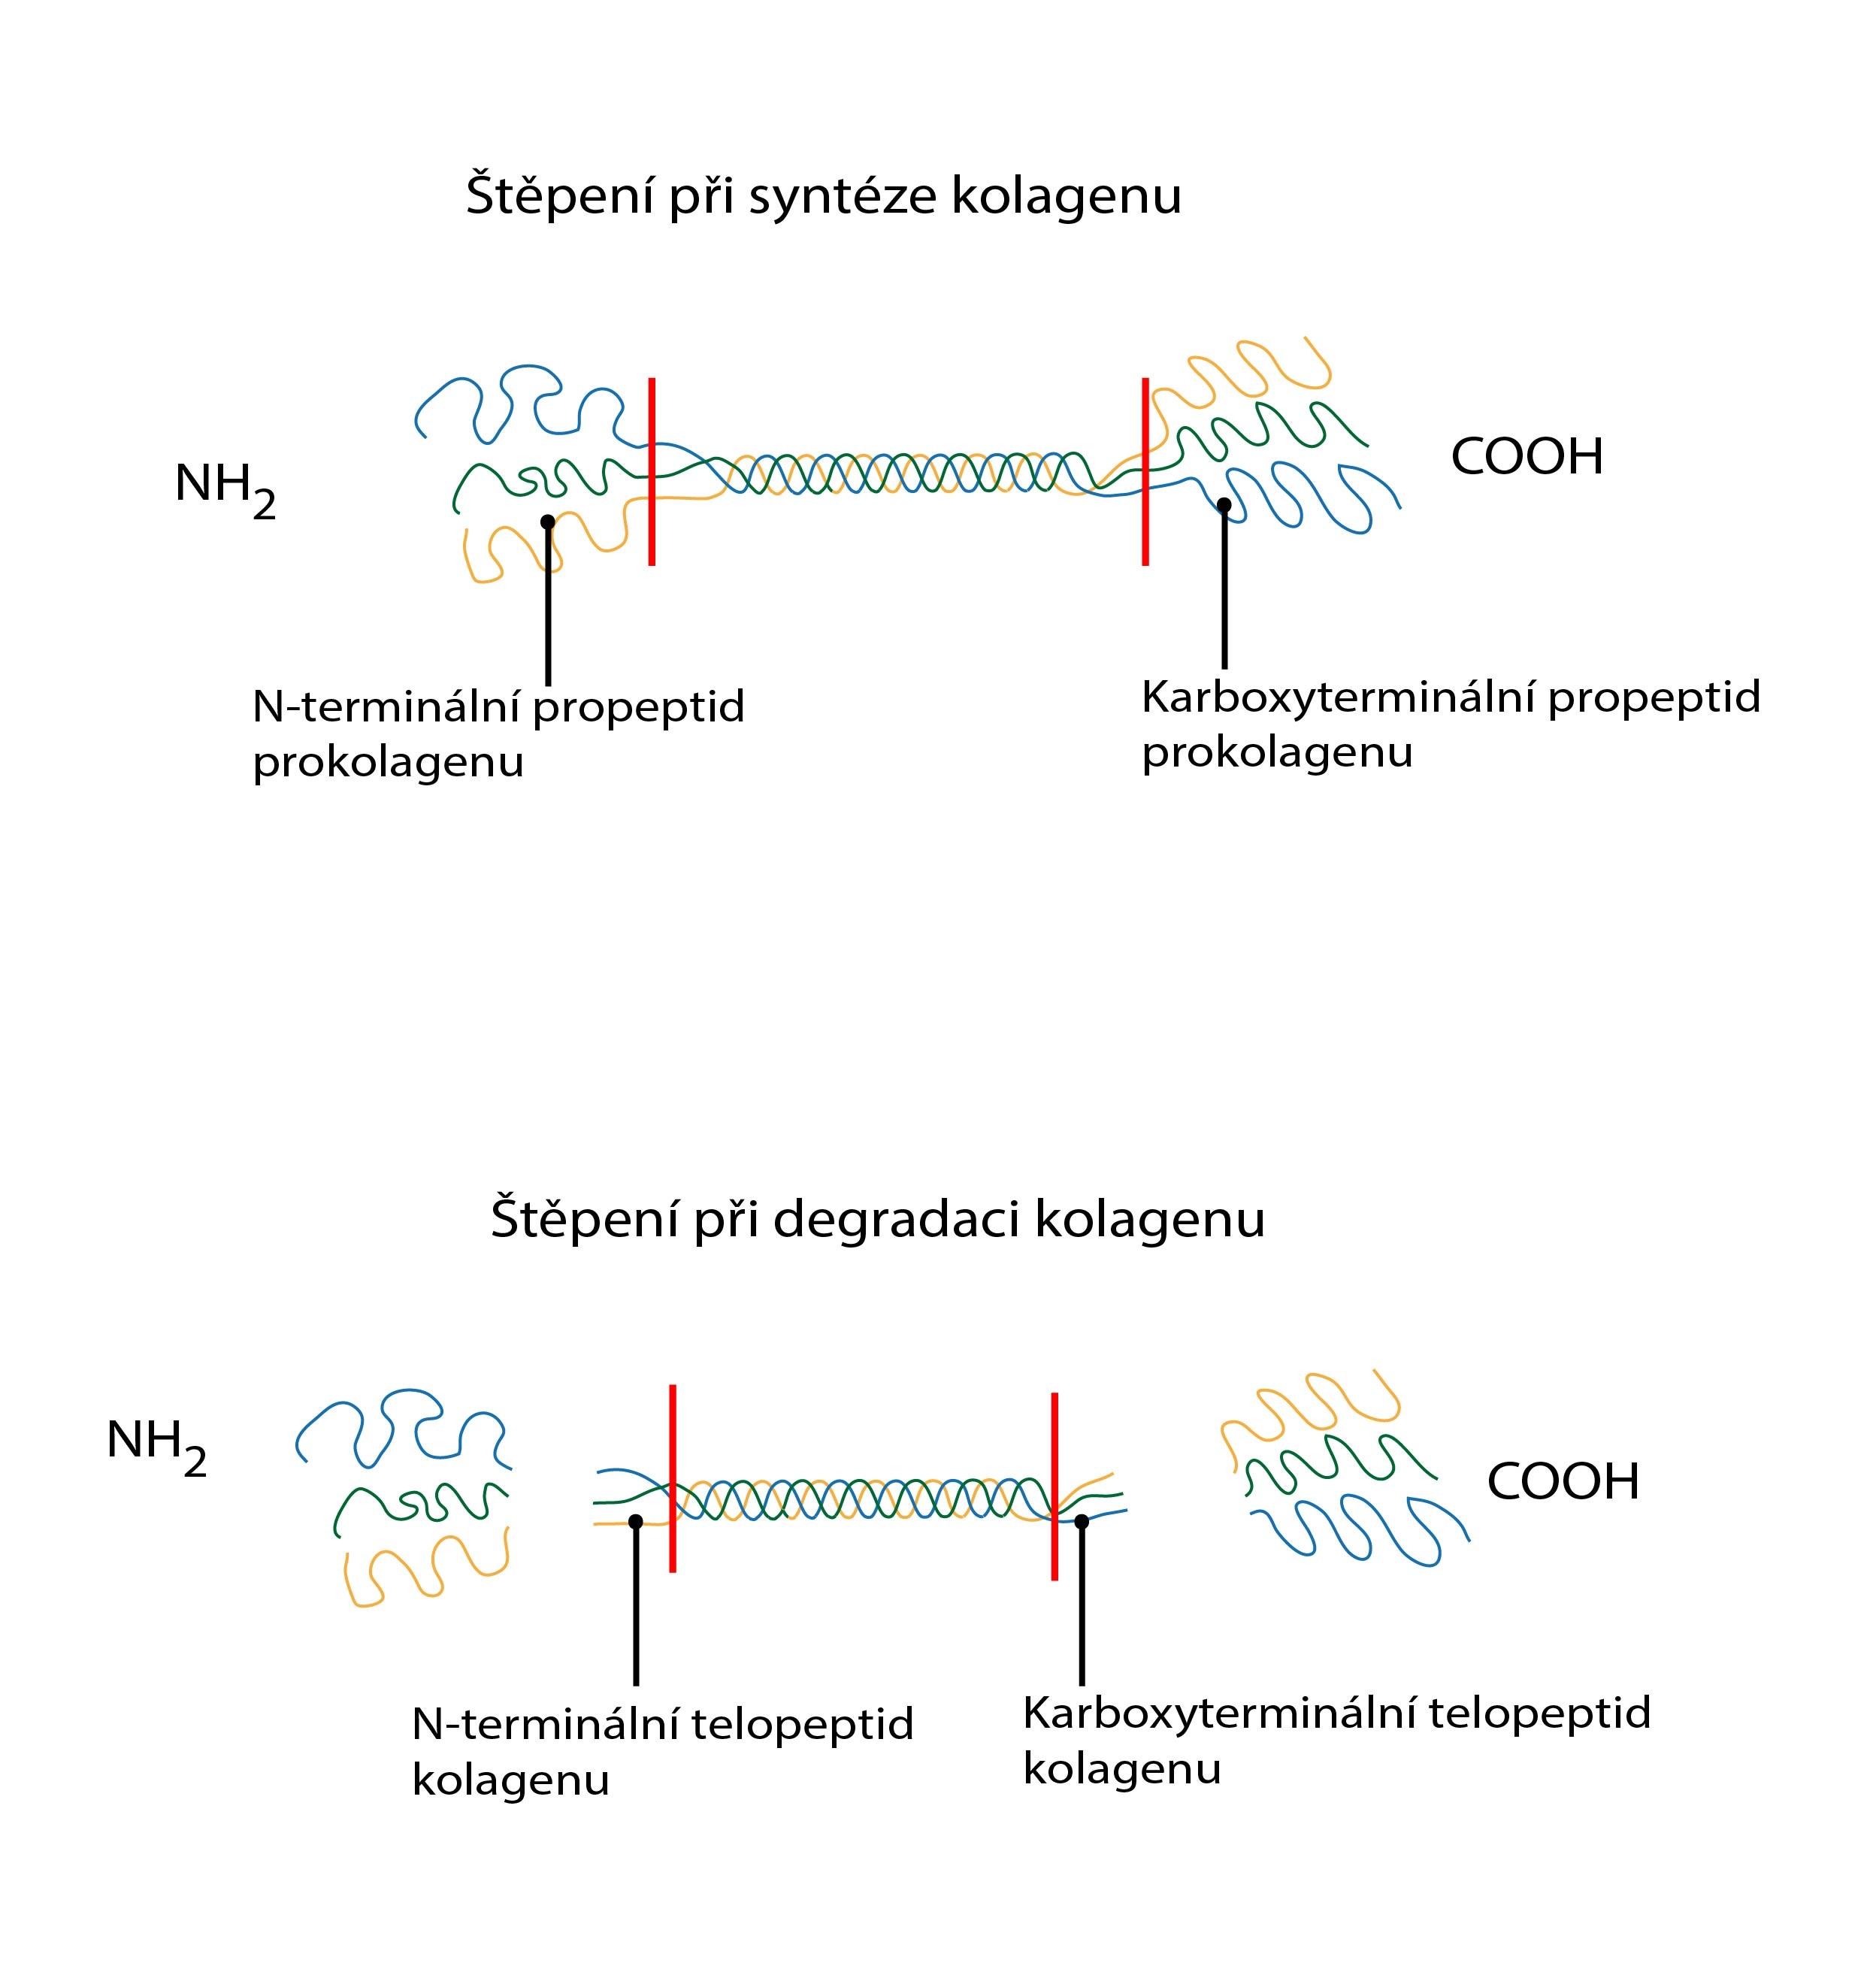 stepeni pri synteze kolagenu-01